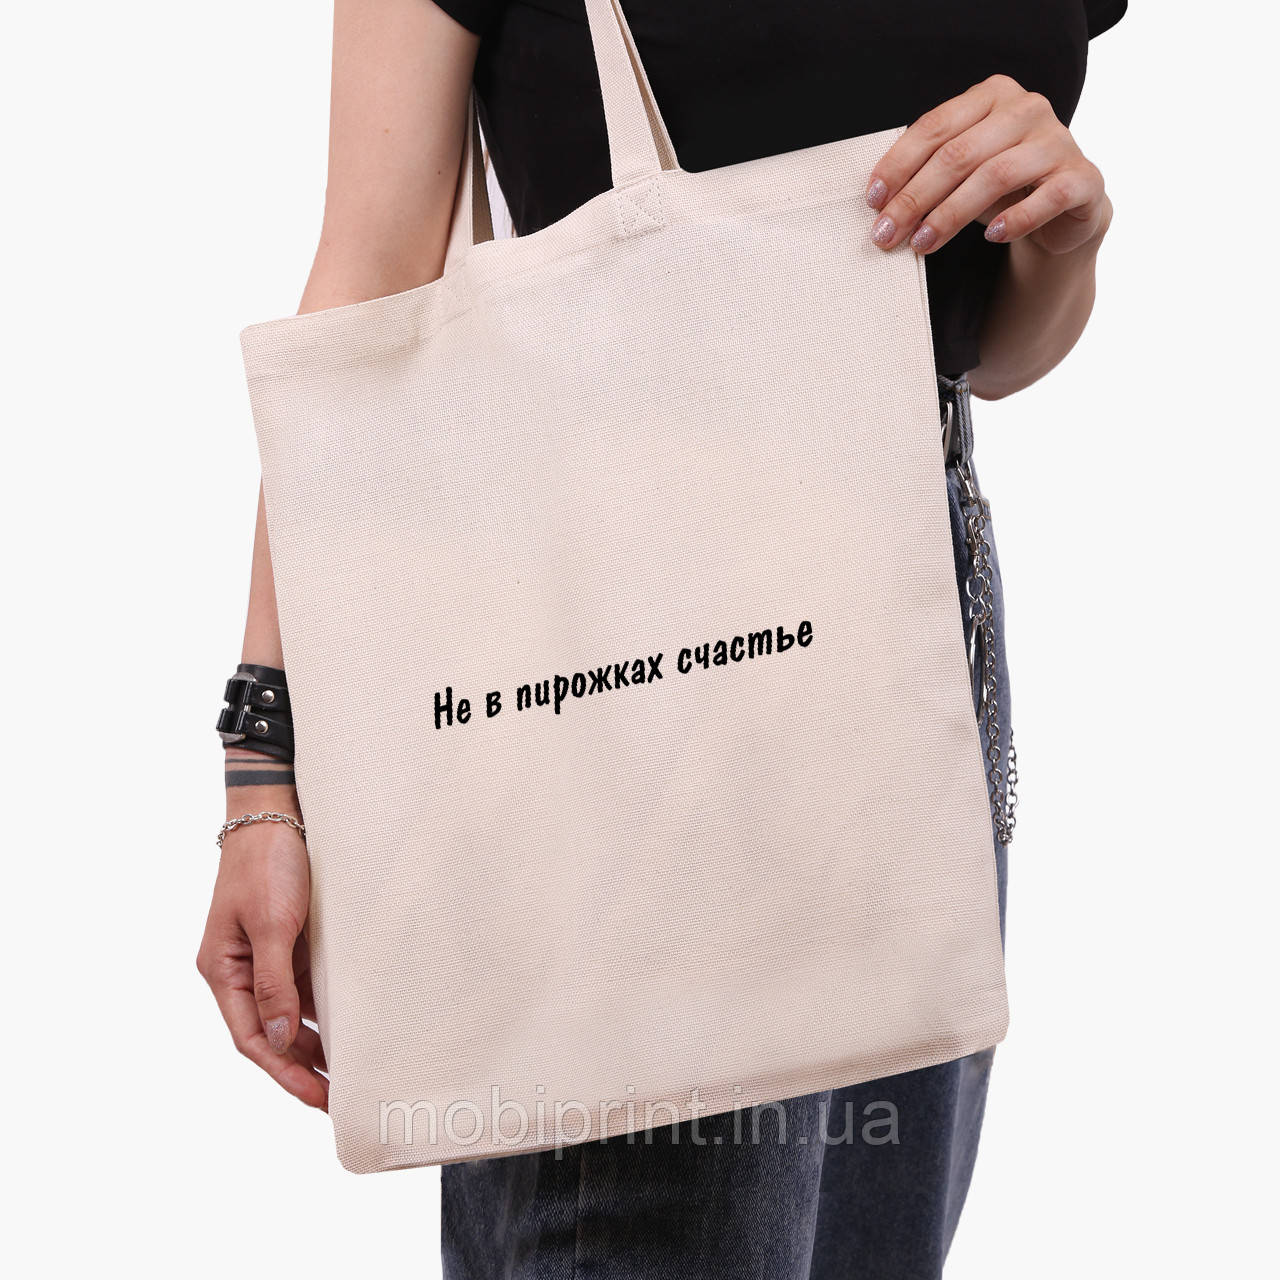 Еко сумка шоппер Не в пиріжках щастя (9227-1292) екосумка шопер 41*35 см